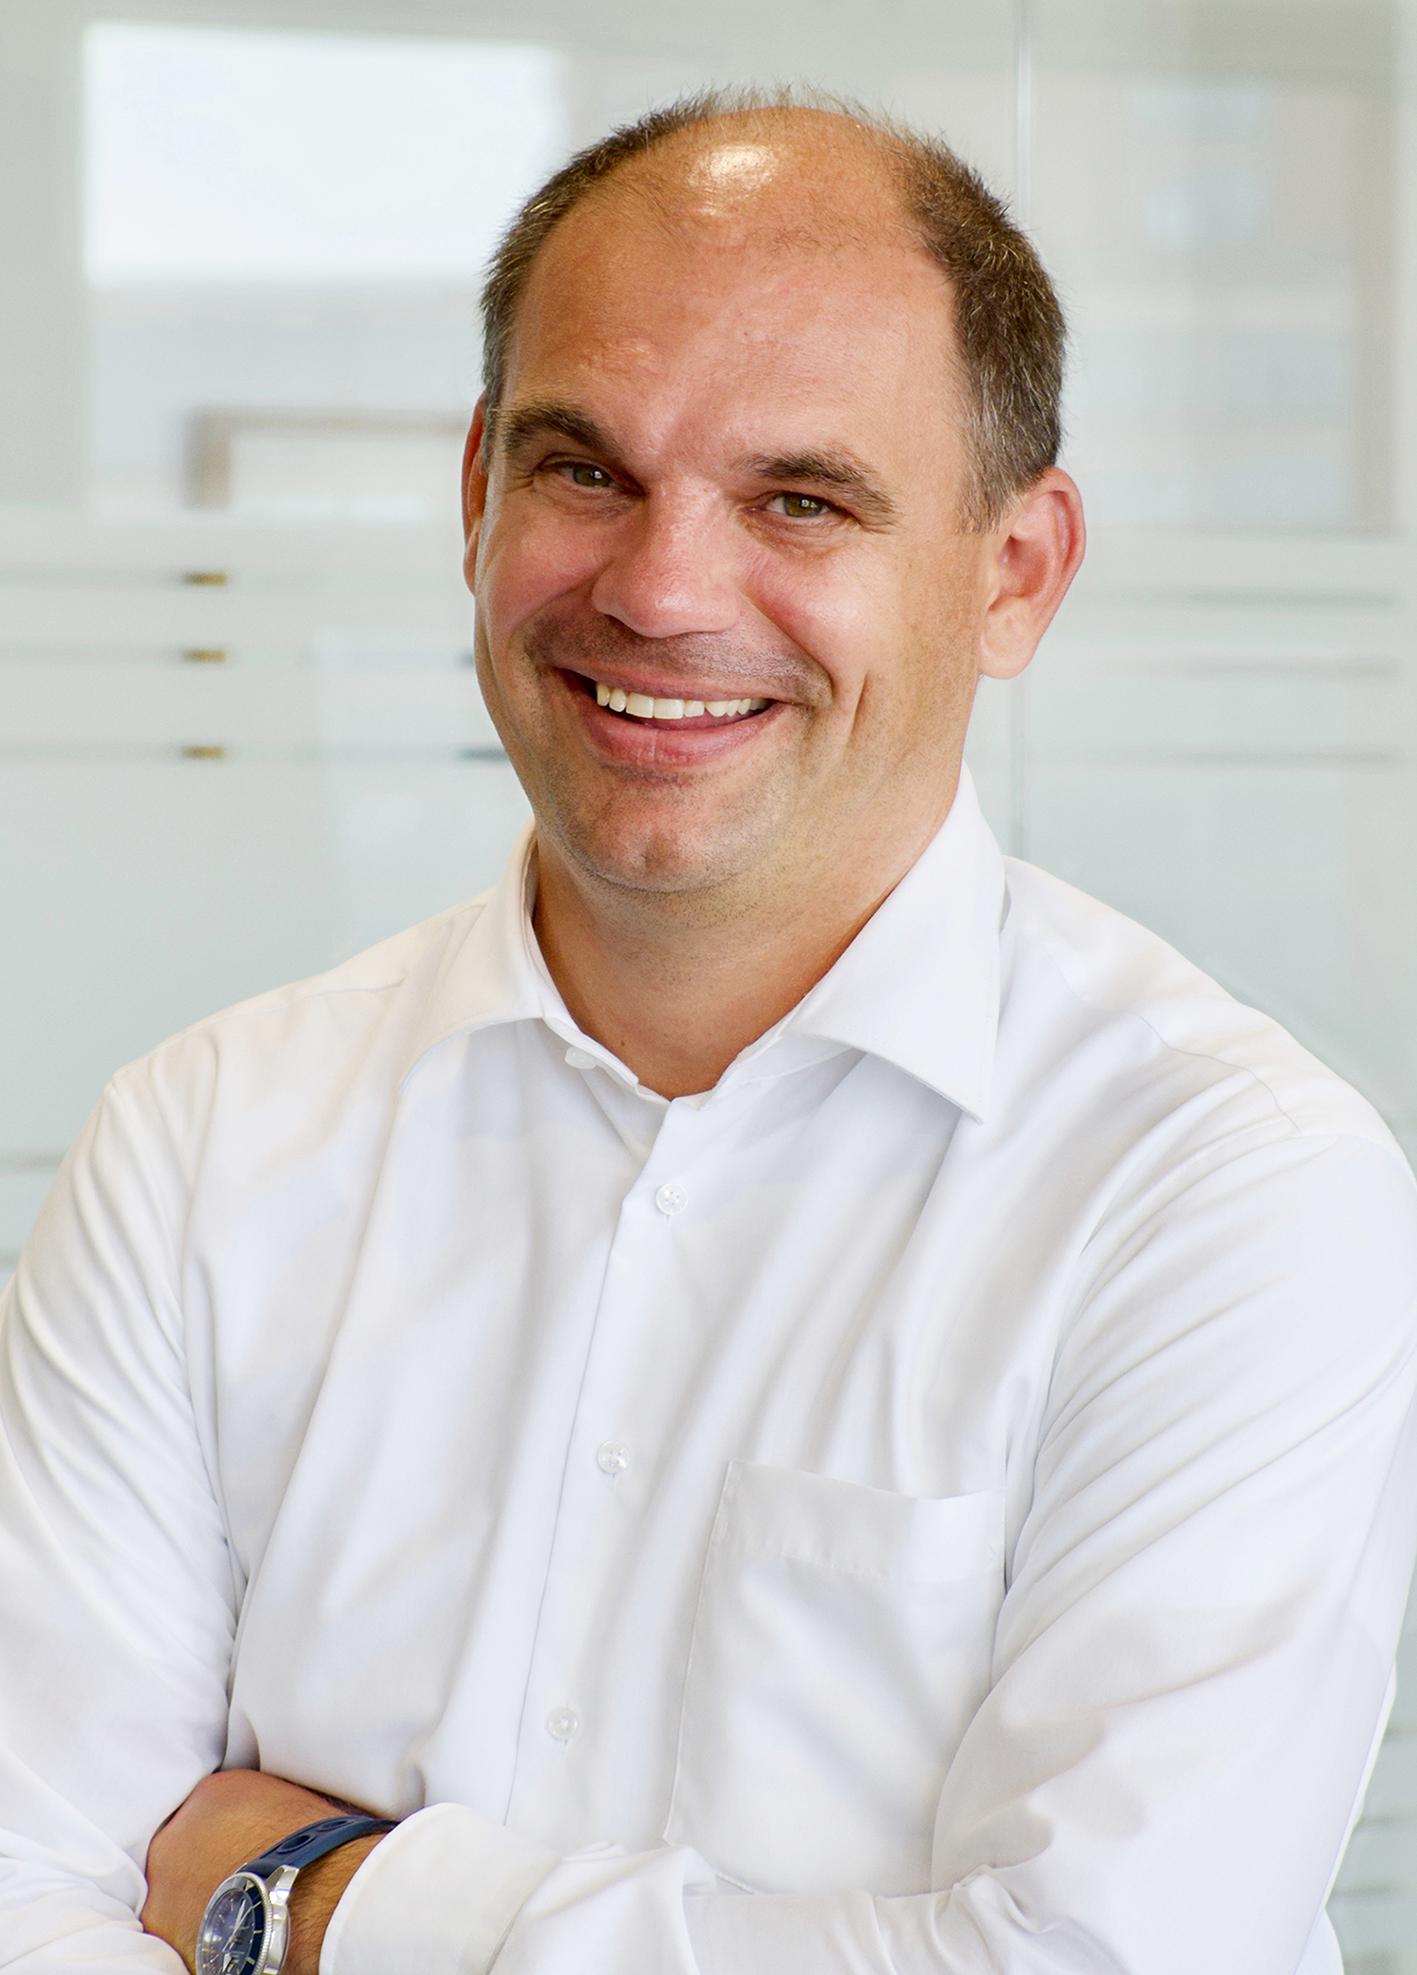 Christoph Schroetter GF W.Droege Assekuradeur GmbH